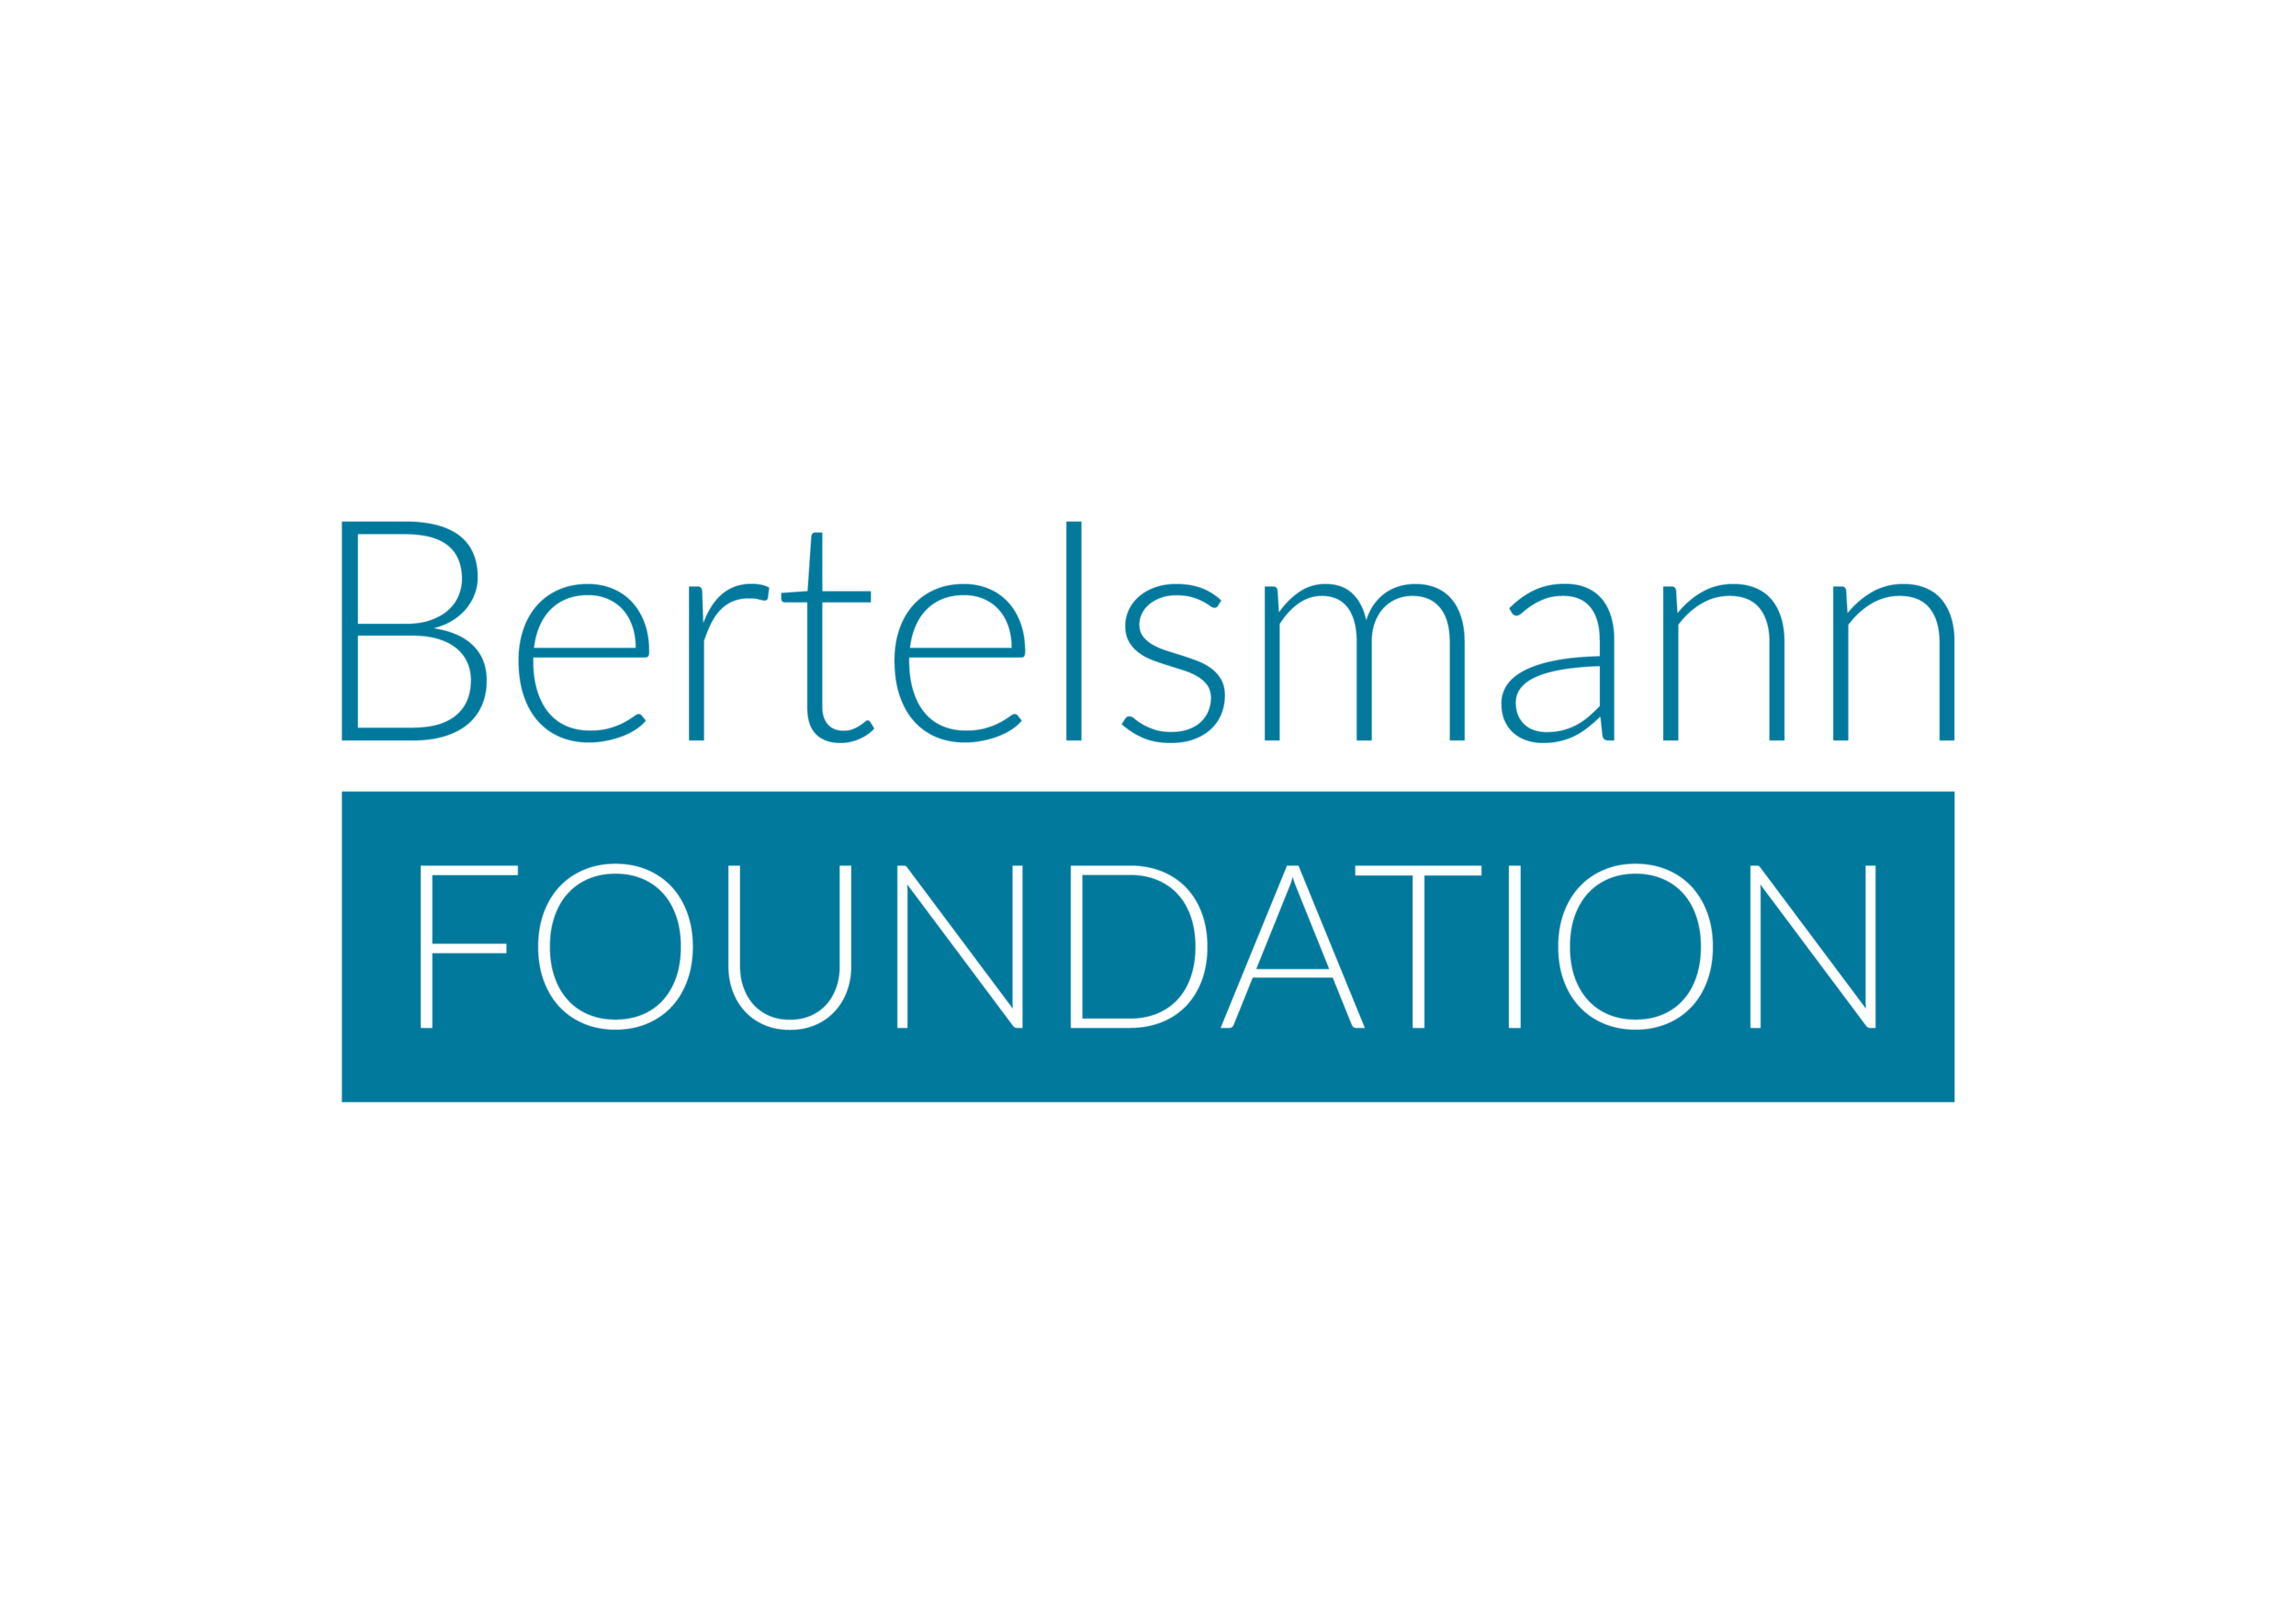 Bertelsmann Foundation.png